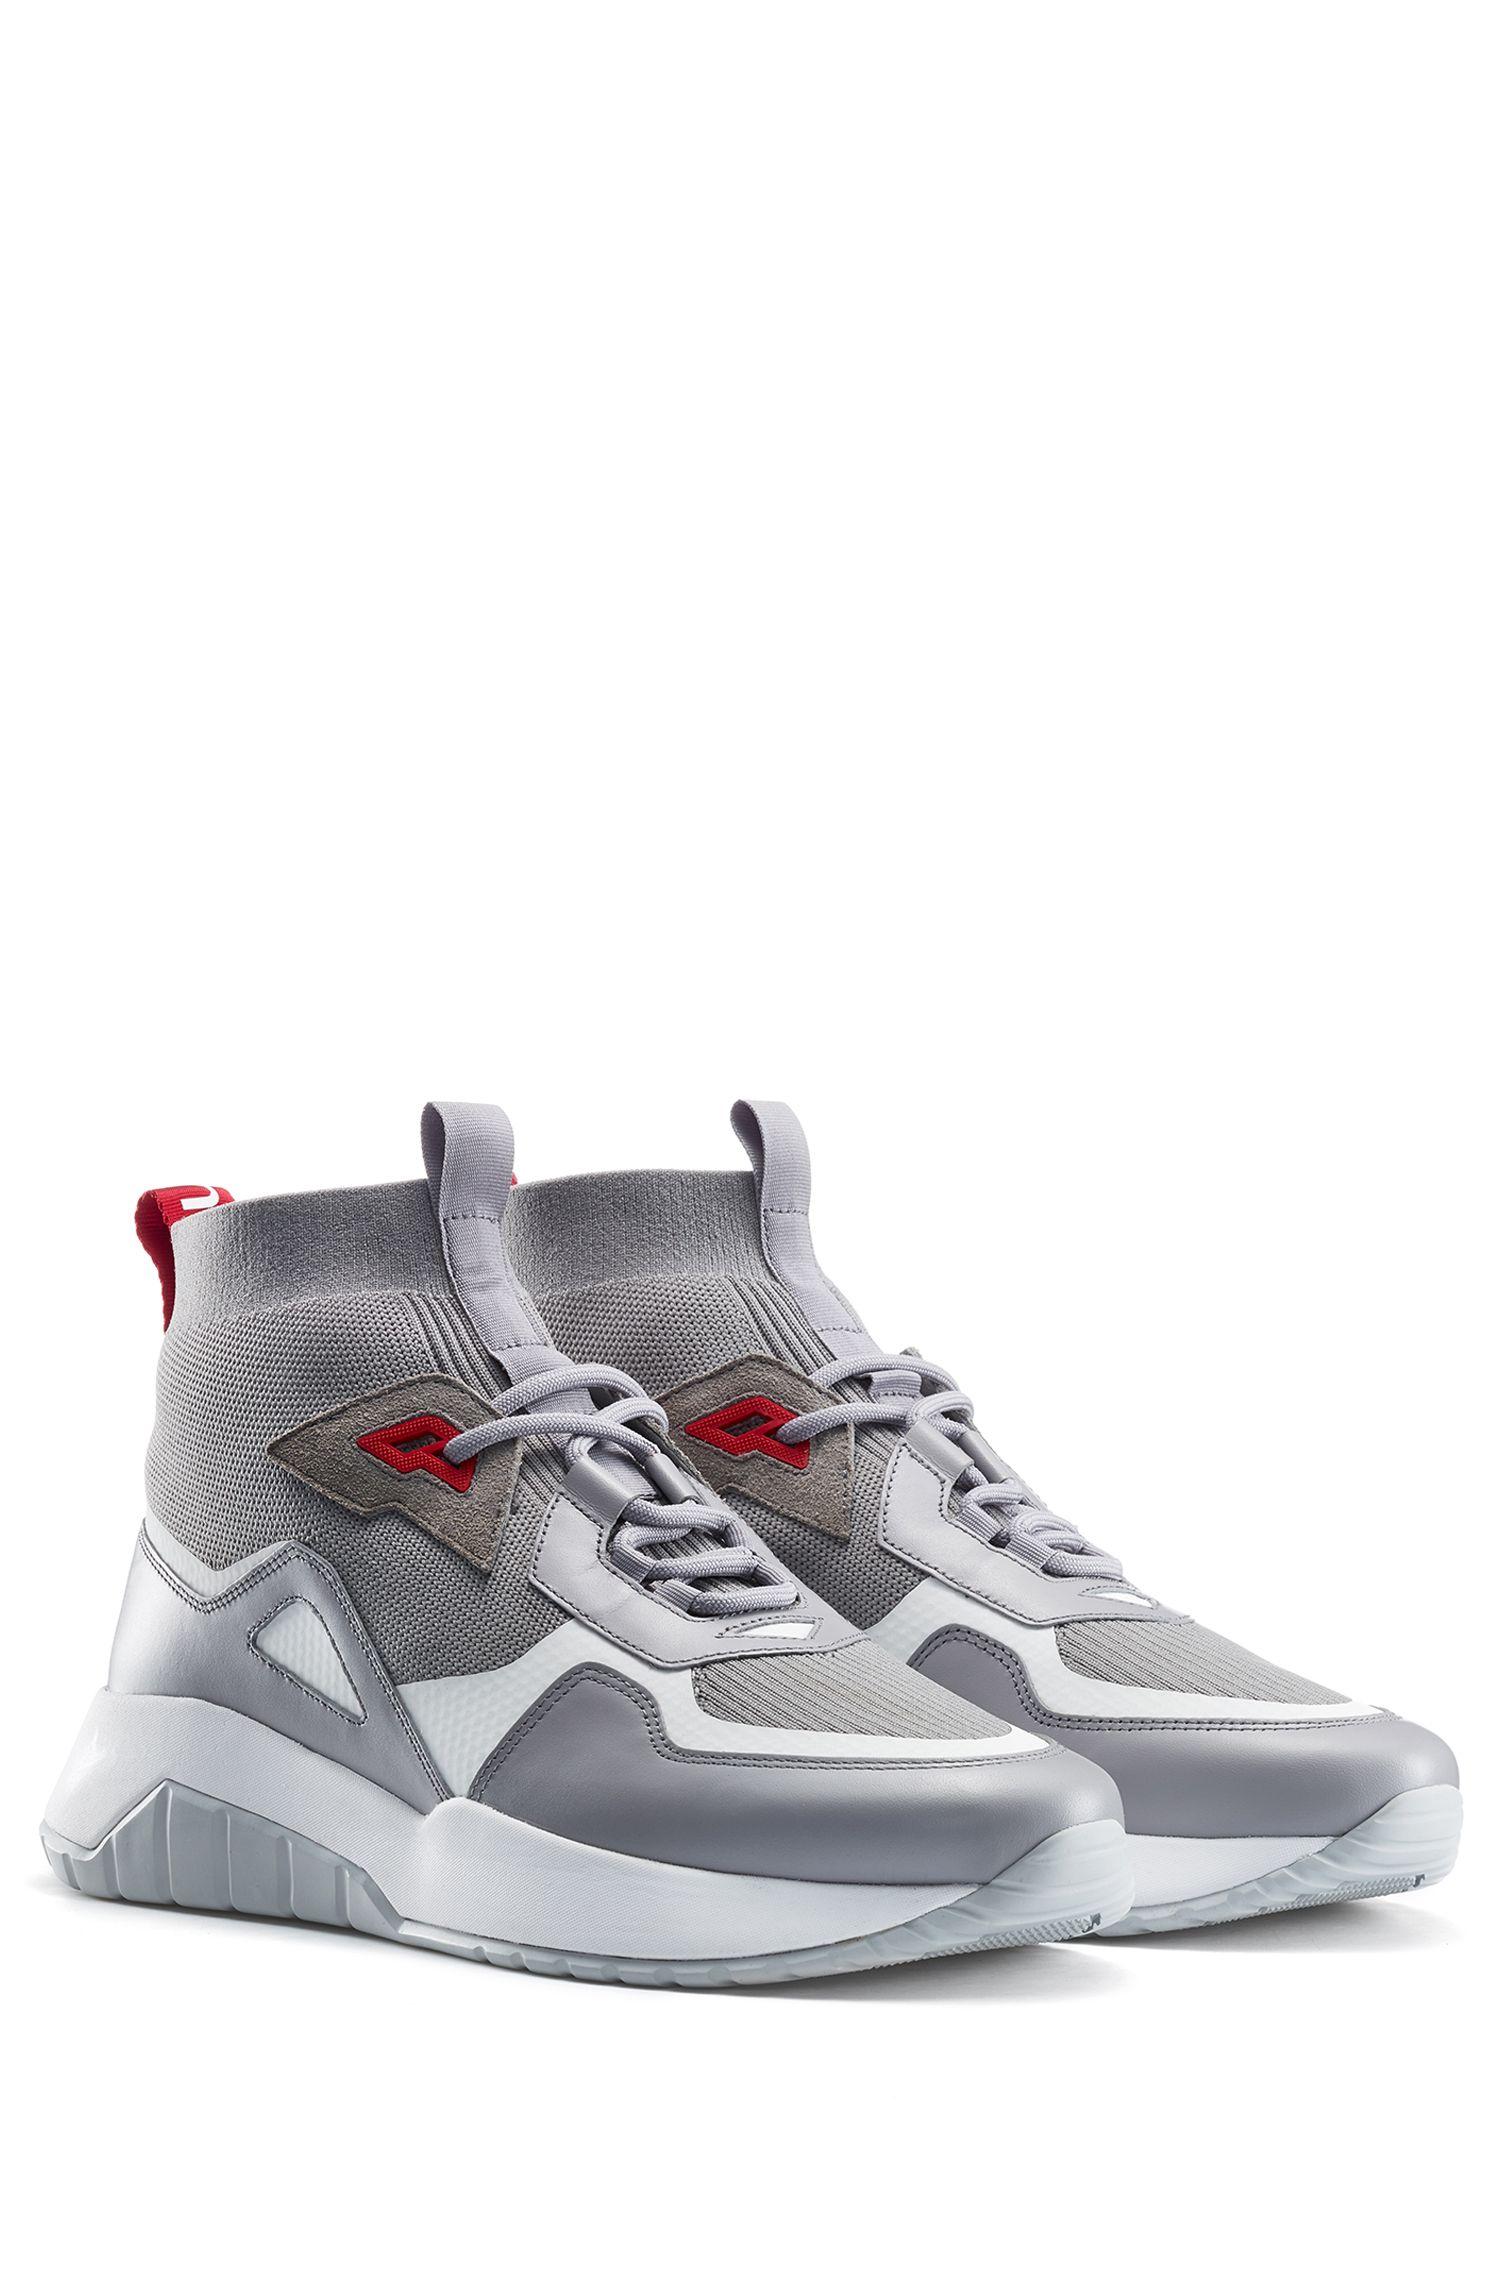 Sneakers mit Stricksocke und dicker Sohle, Grau